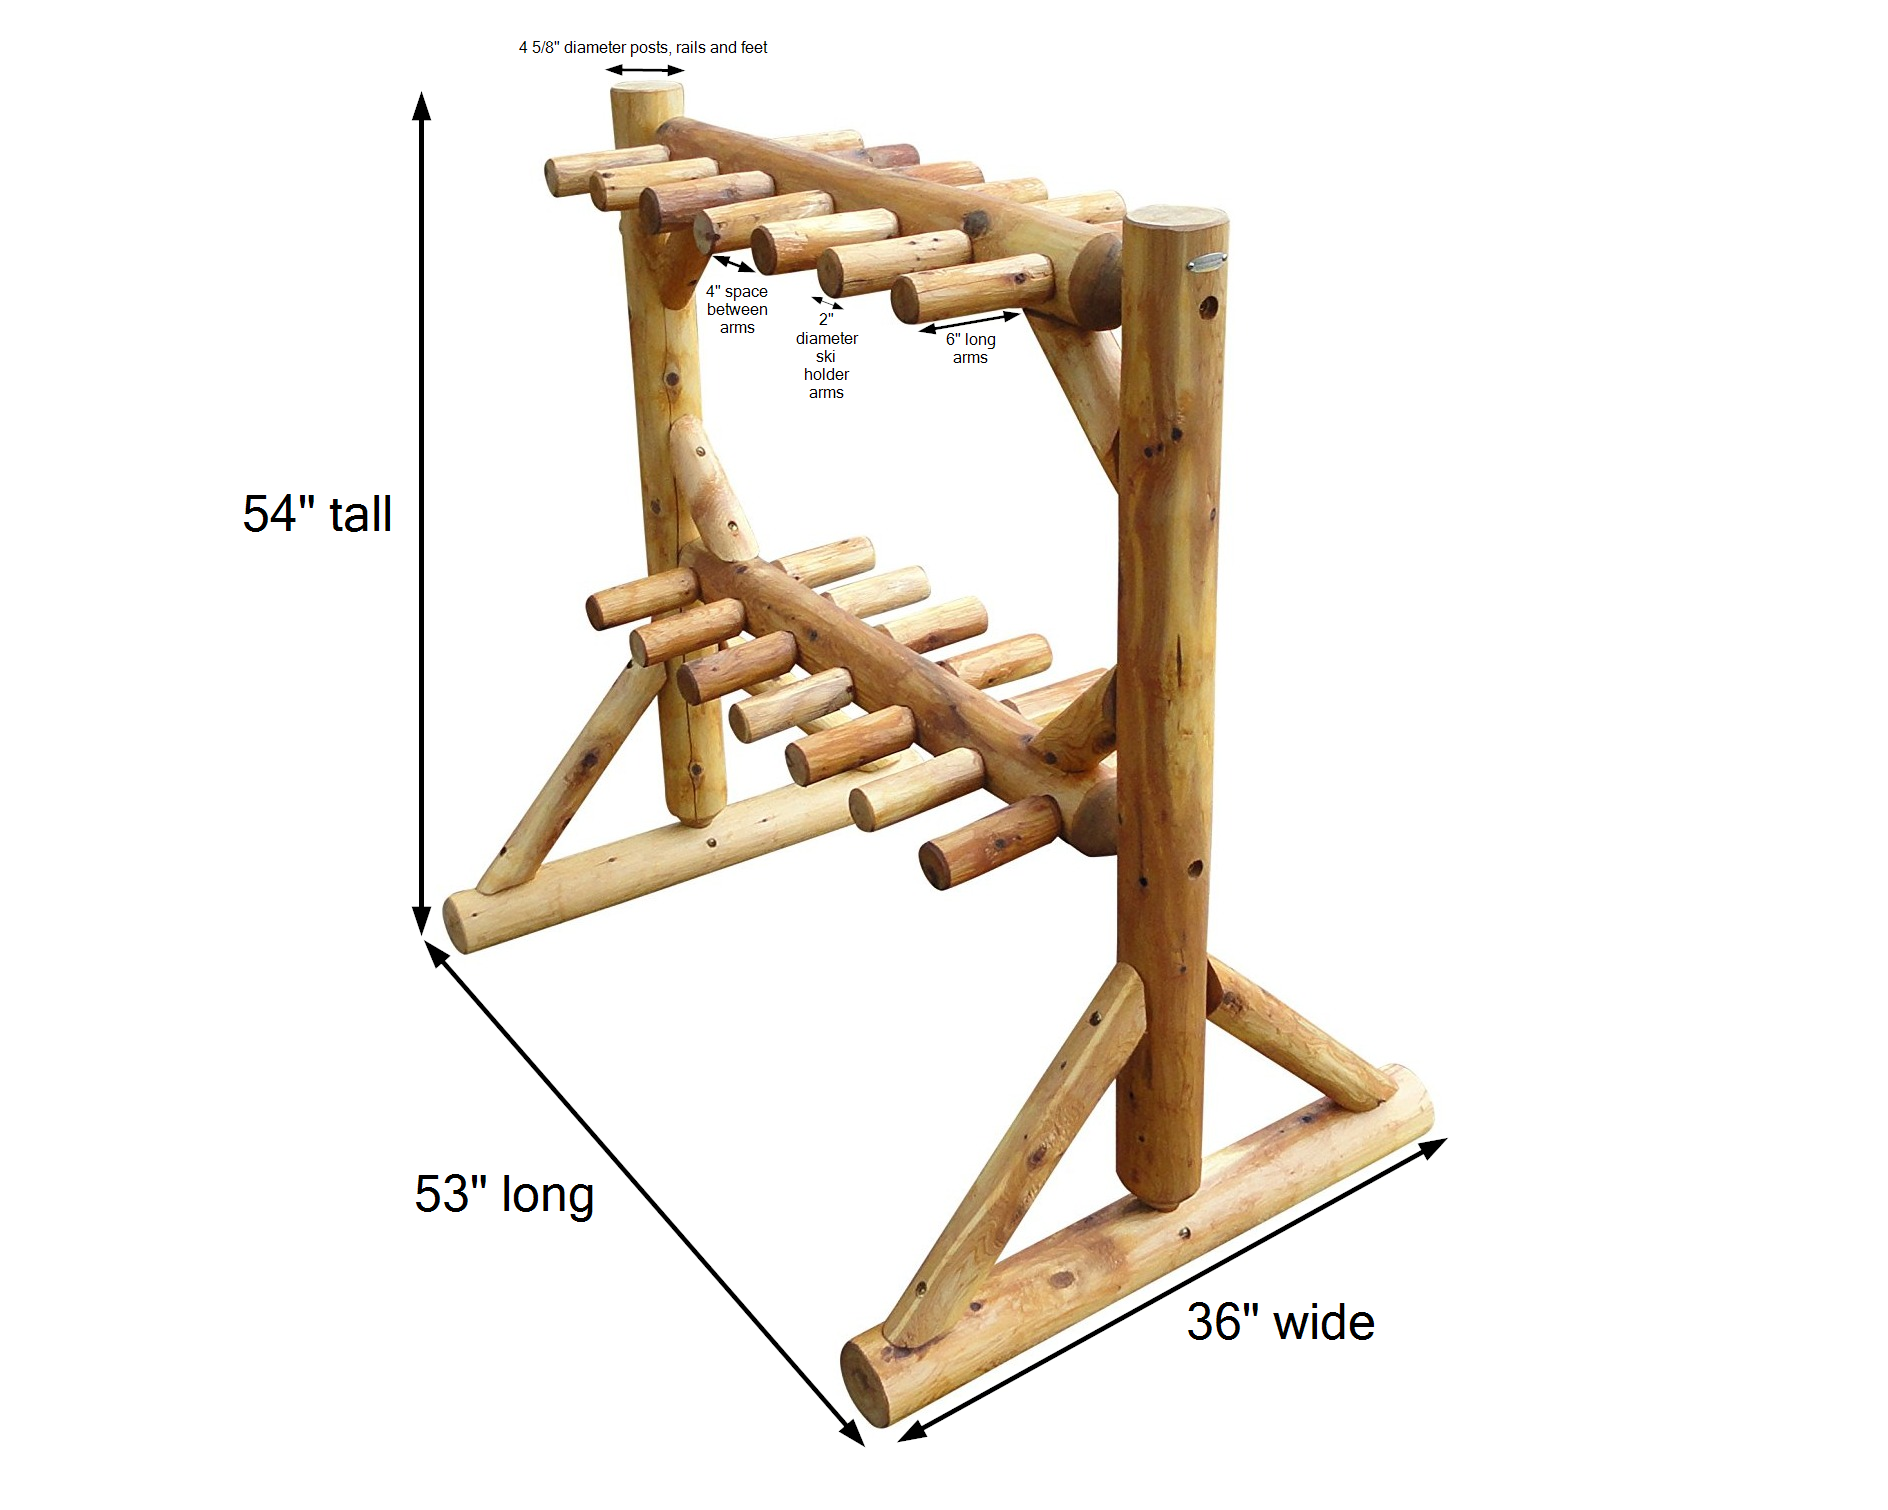 log-ski-rack-dimensions.jpeg